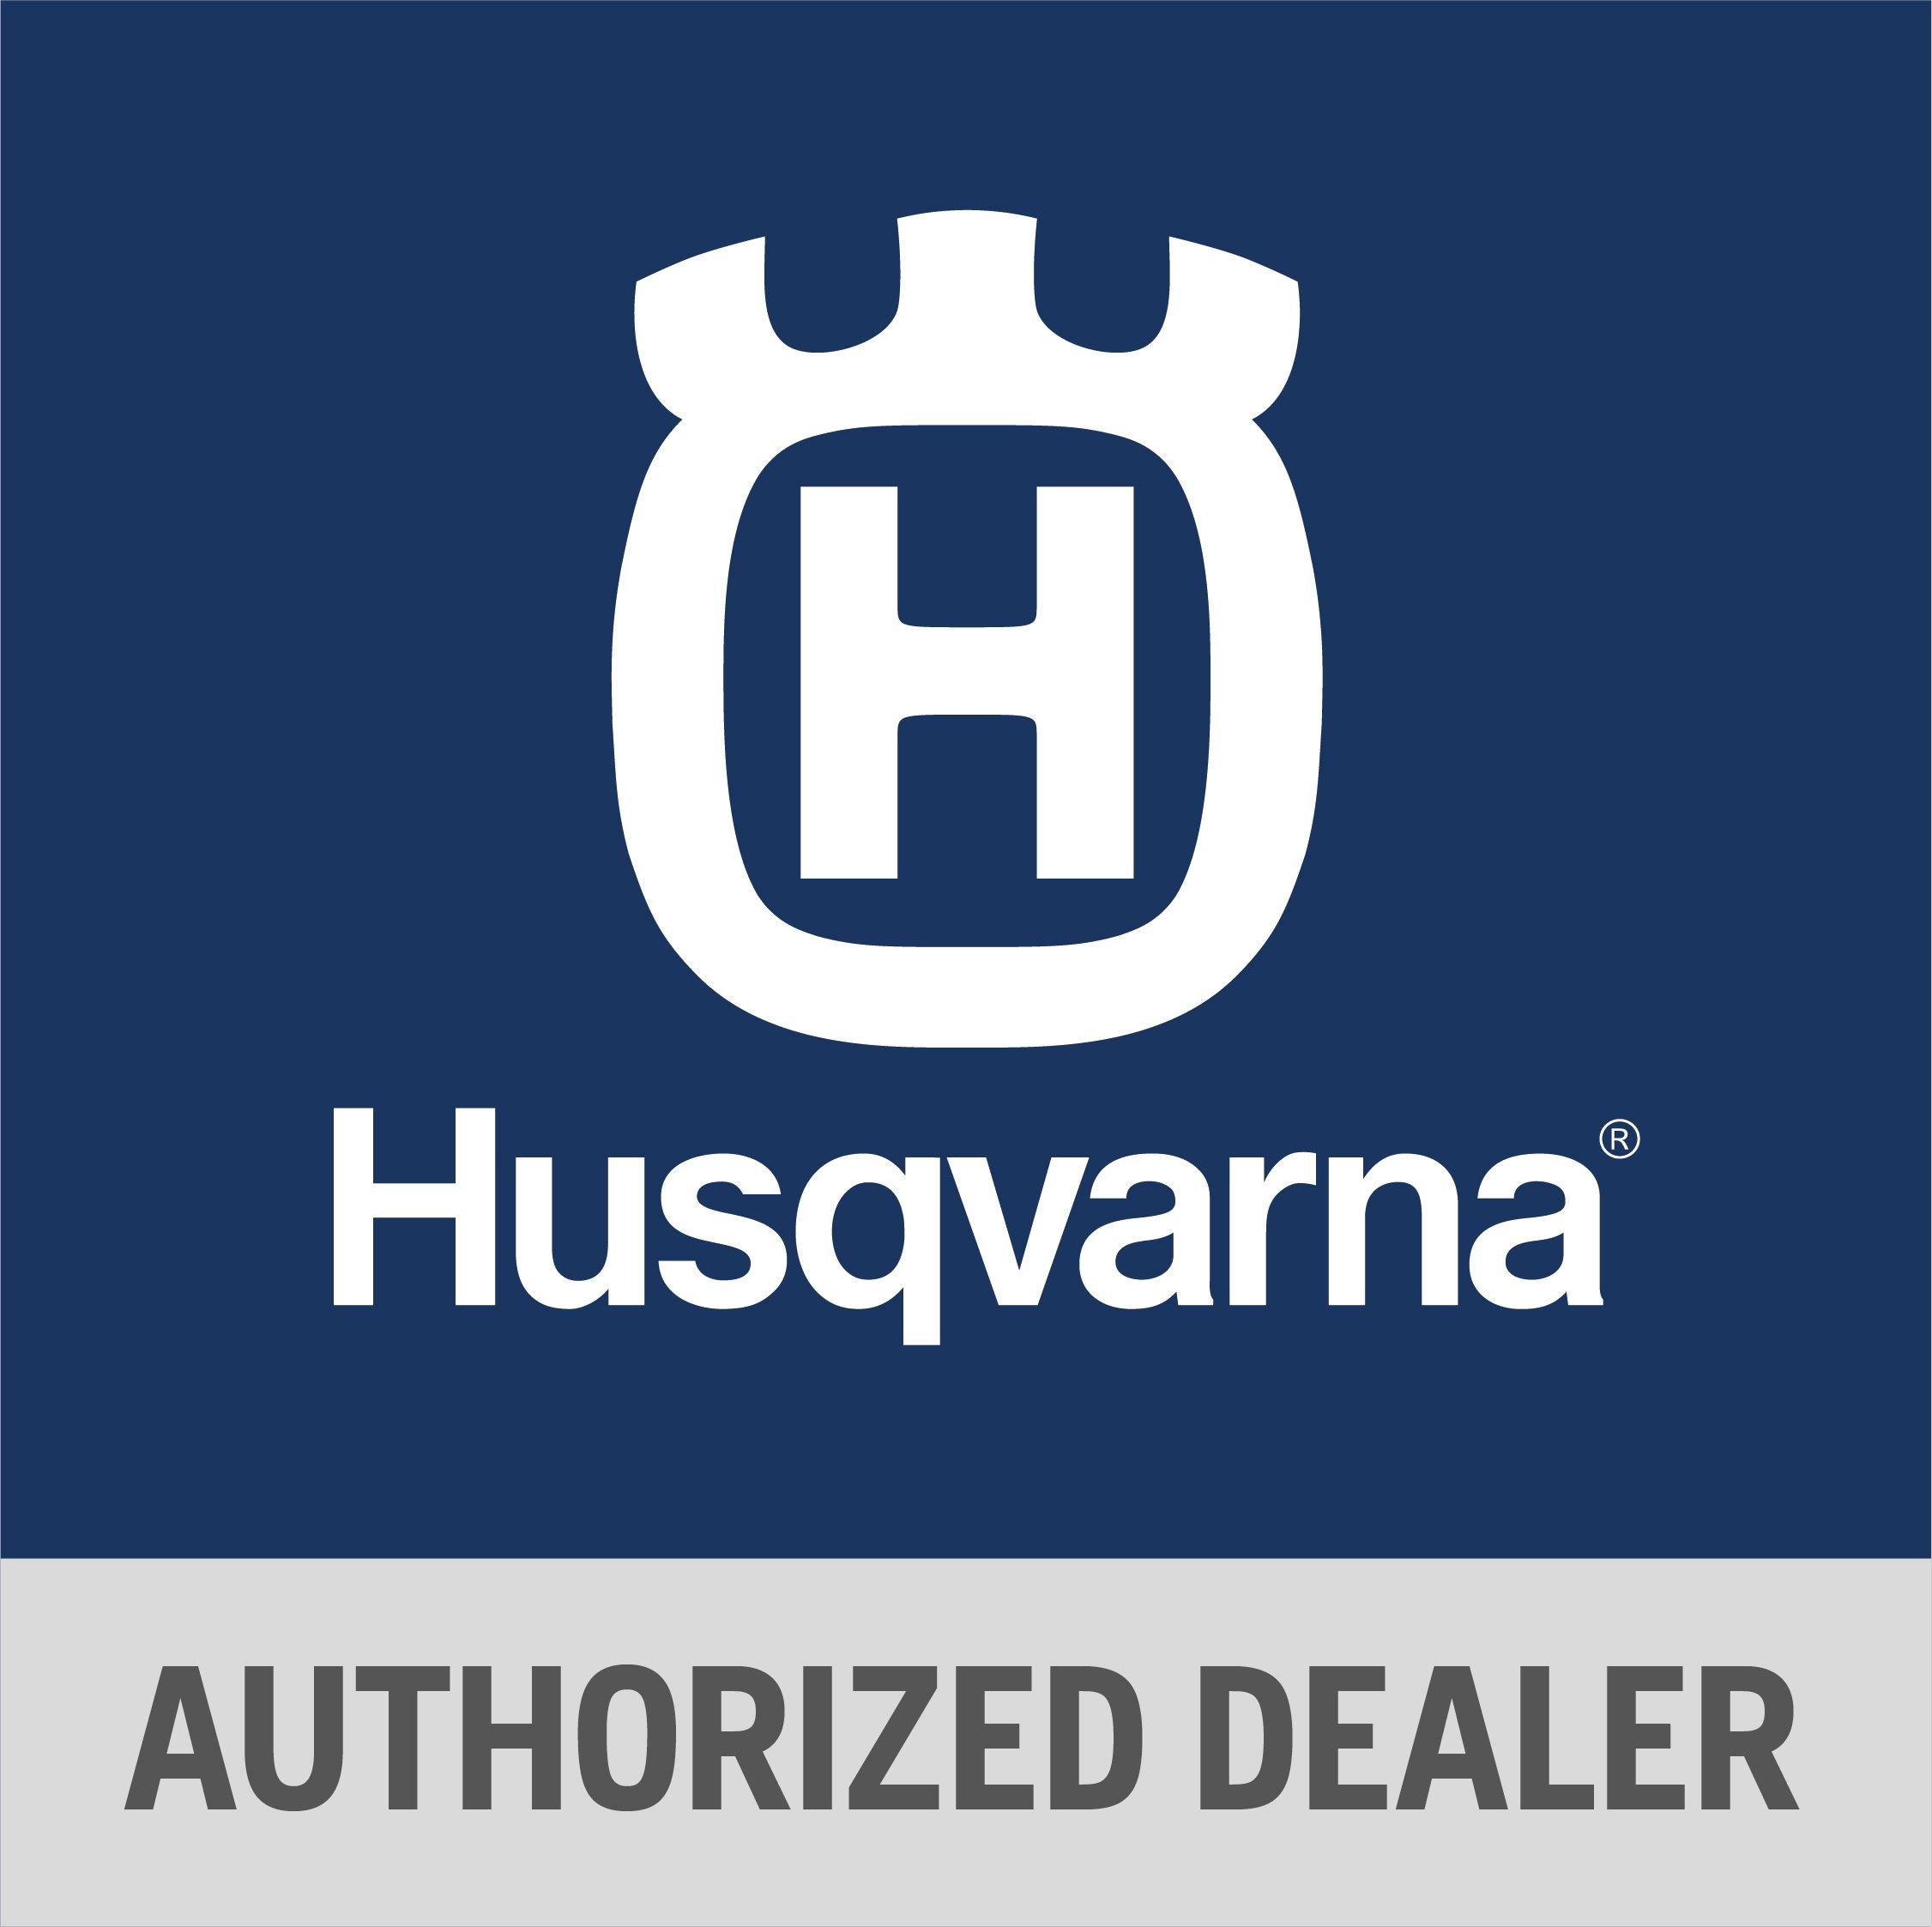 3 Lakes Landscape Supply Named Husqvarna Authorized Dealer